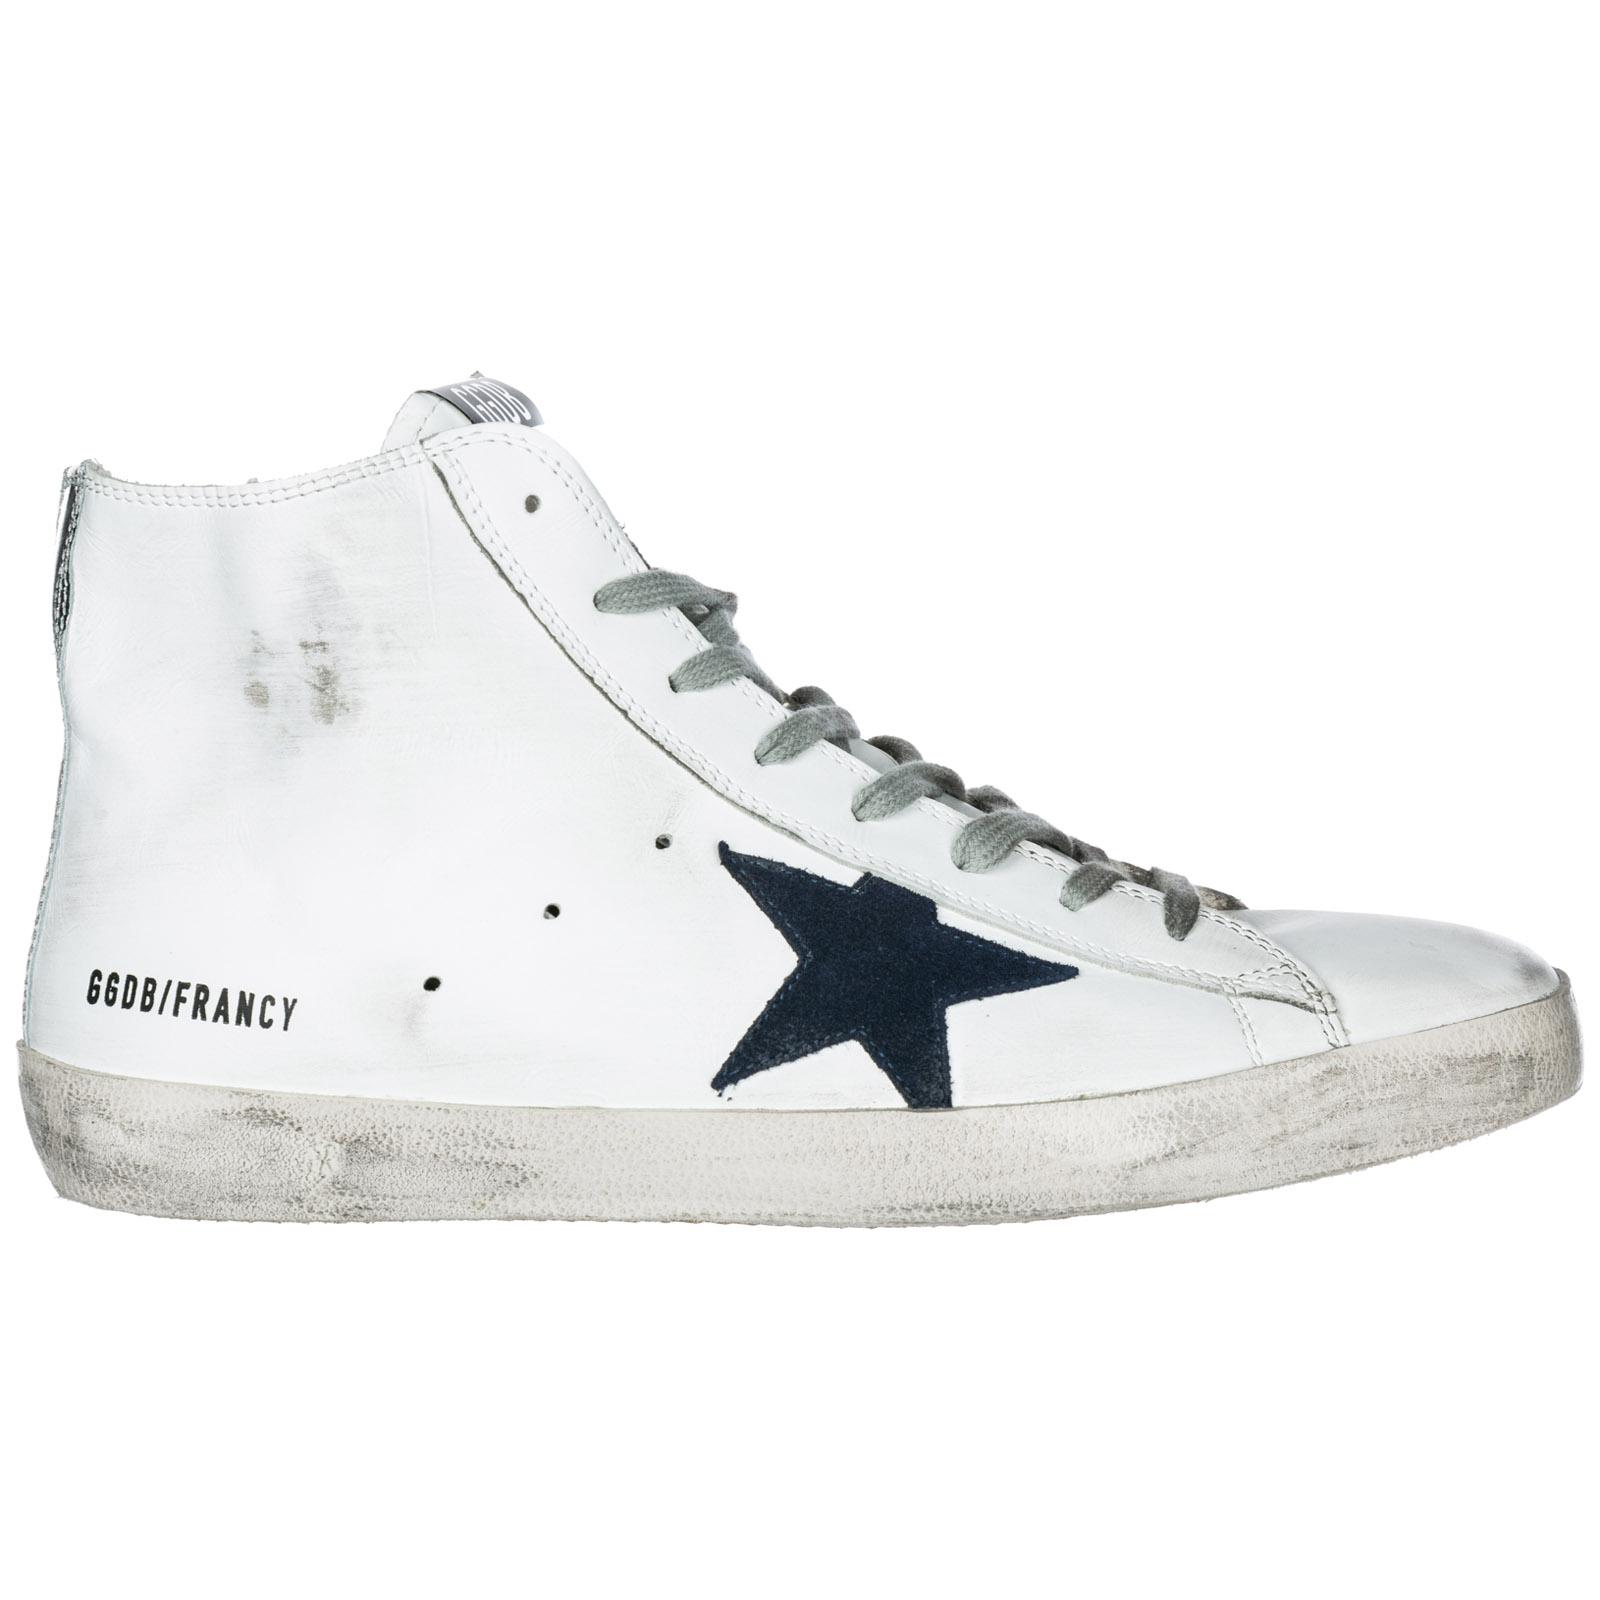 G33ms591 Sneakers Top White b39 High Bluette Goose Golden Francy w6Xanxd5q1